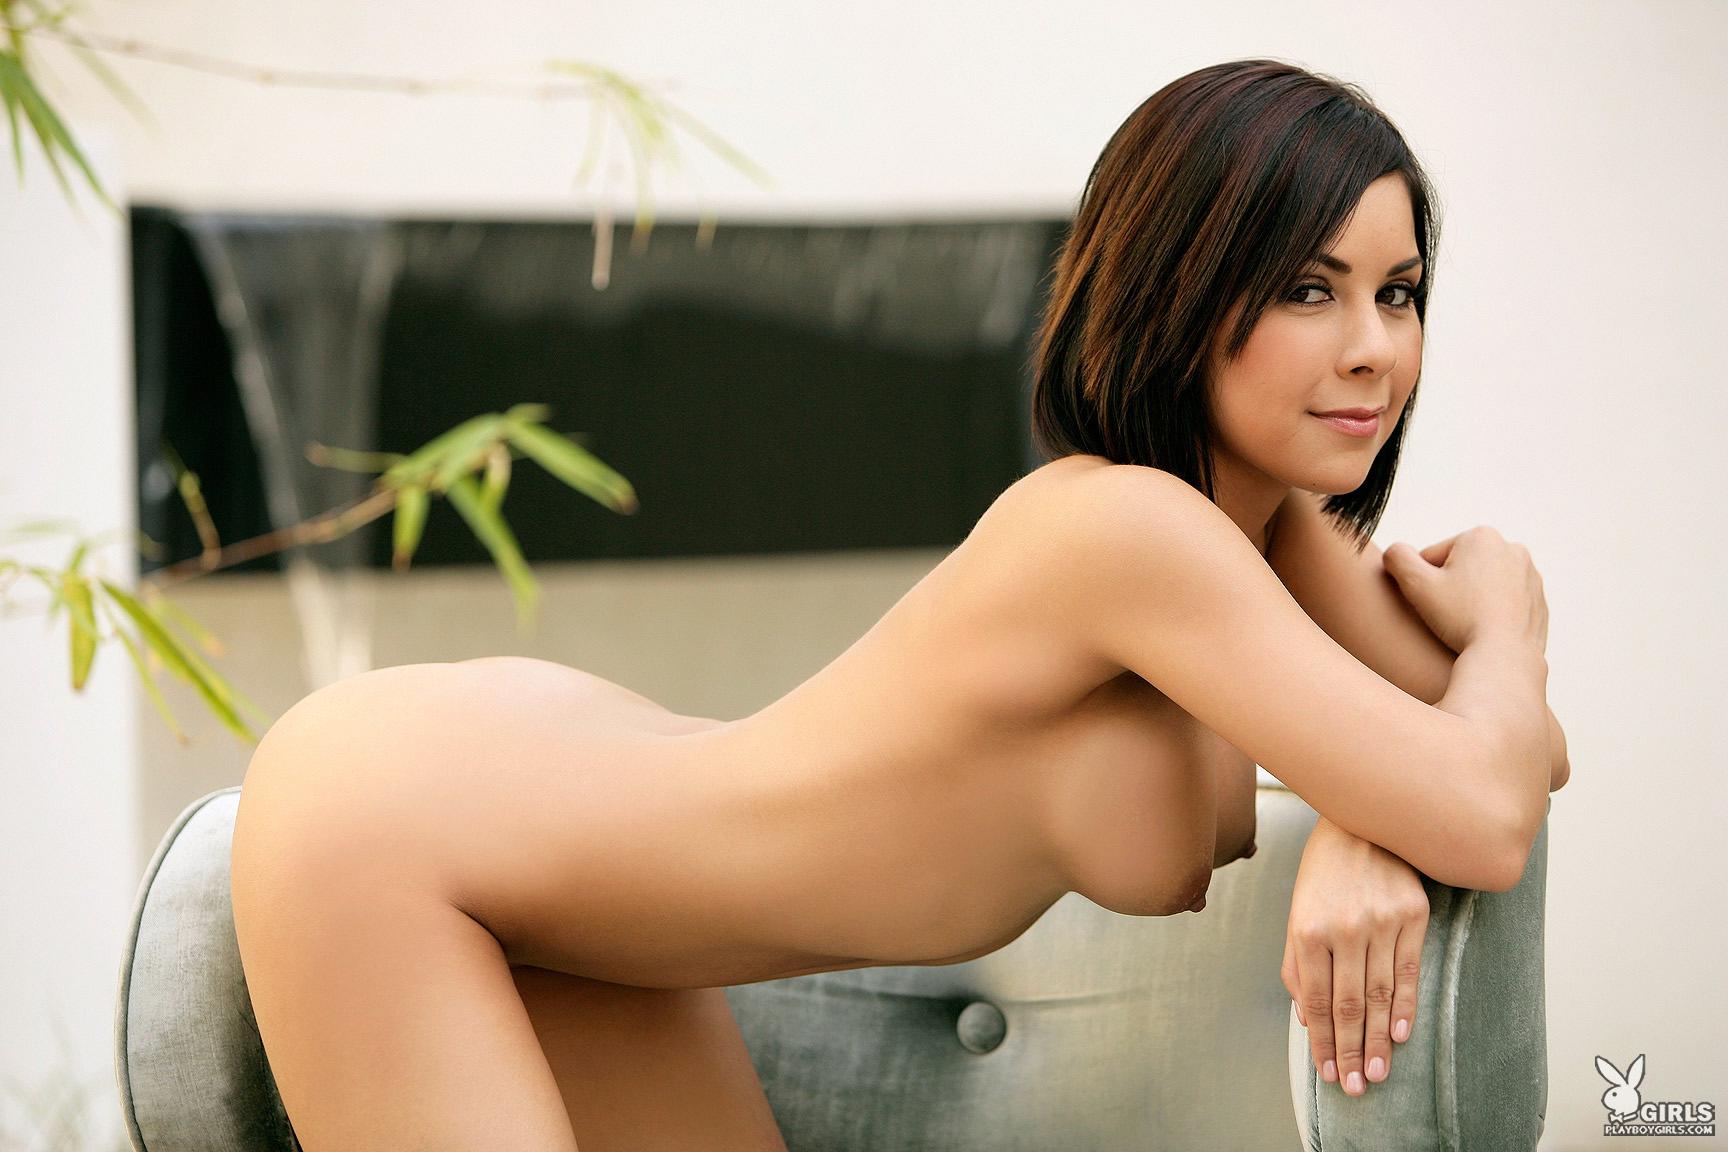 Natasha taylor playboy